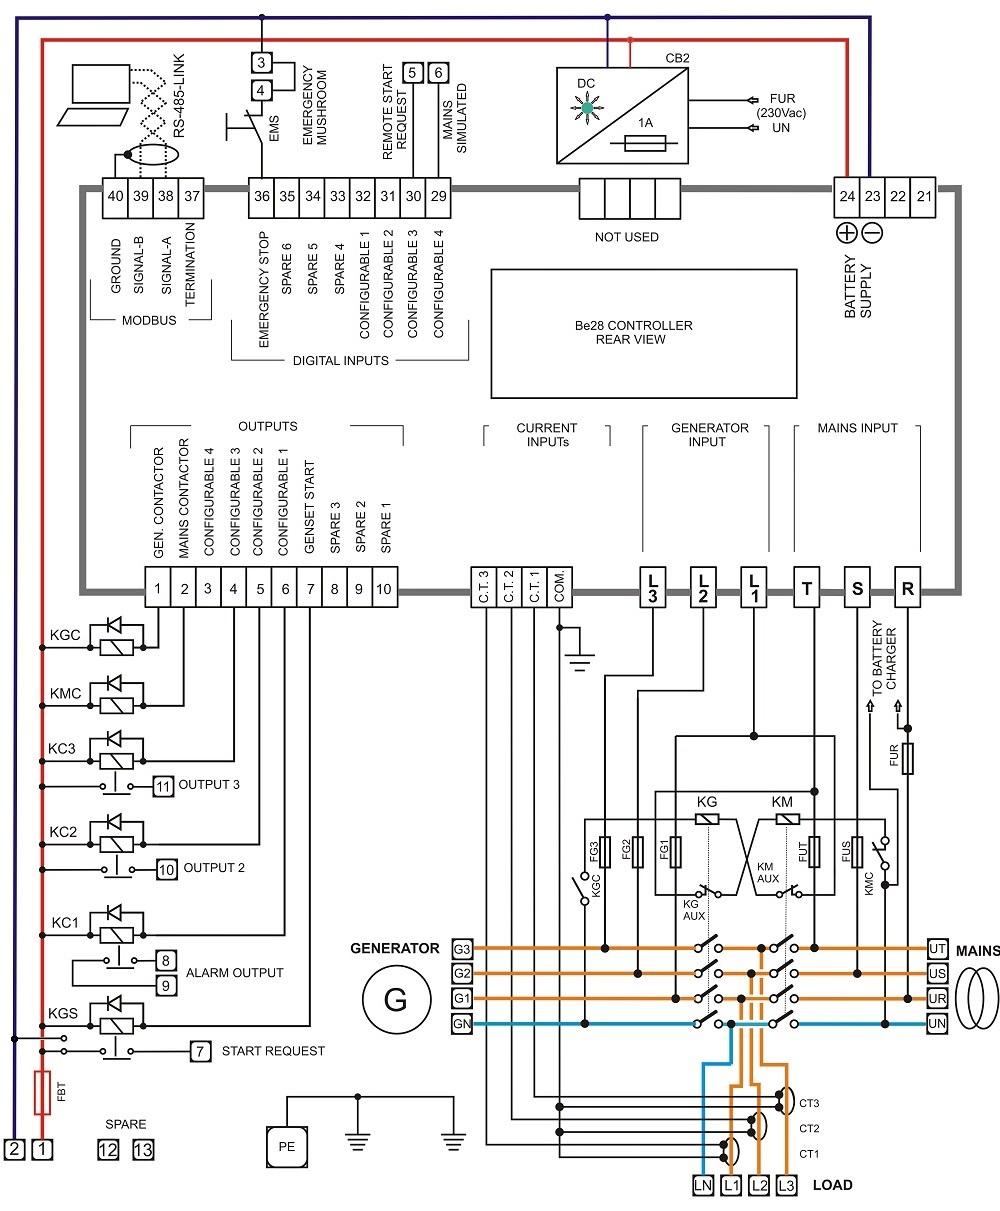 Citroen Relay 3 Wiring Diagram - Free Vehicle Wiring Diagrams •